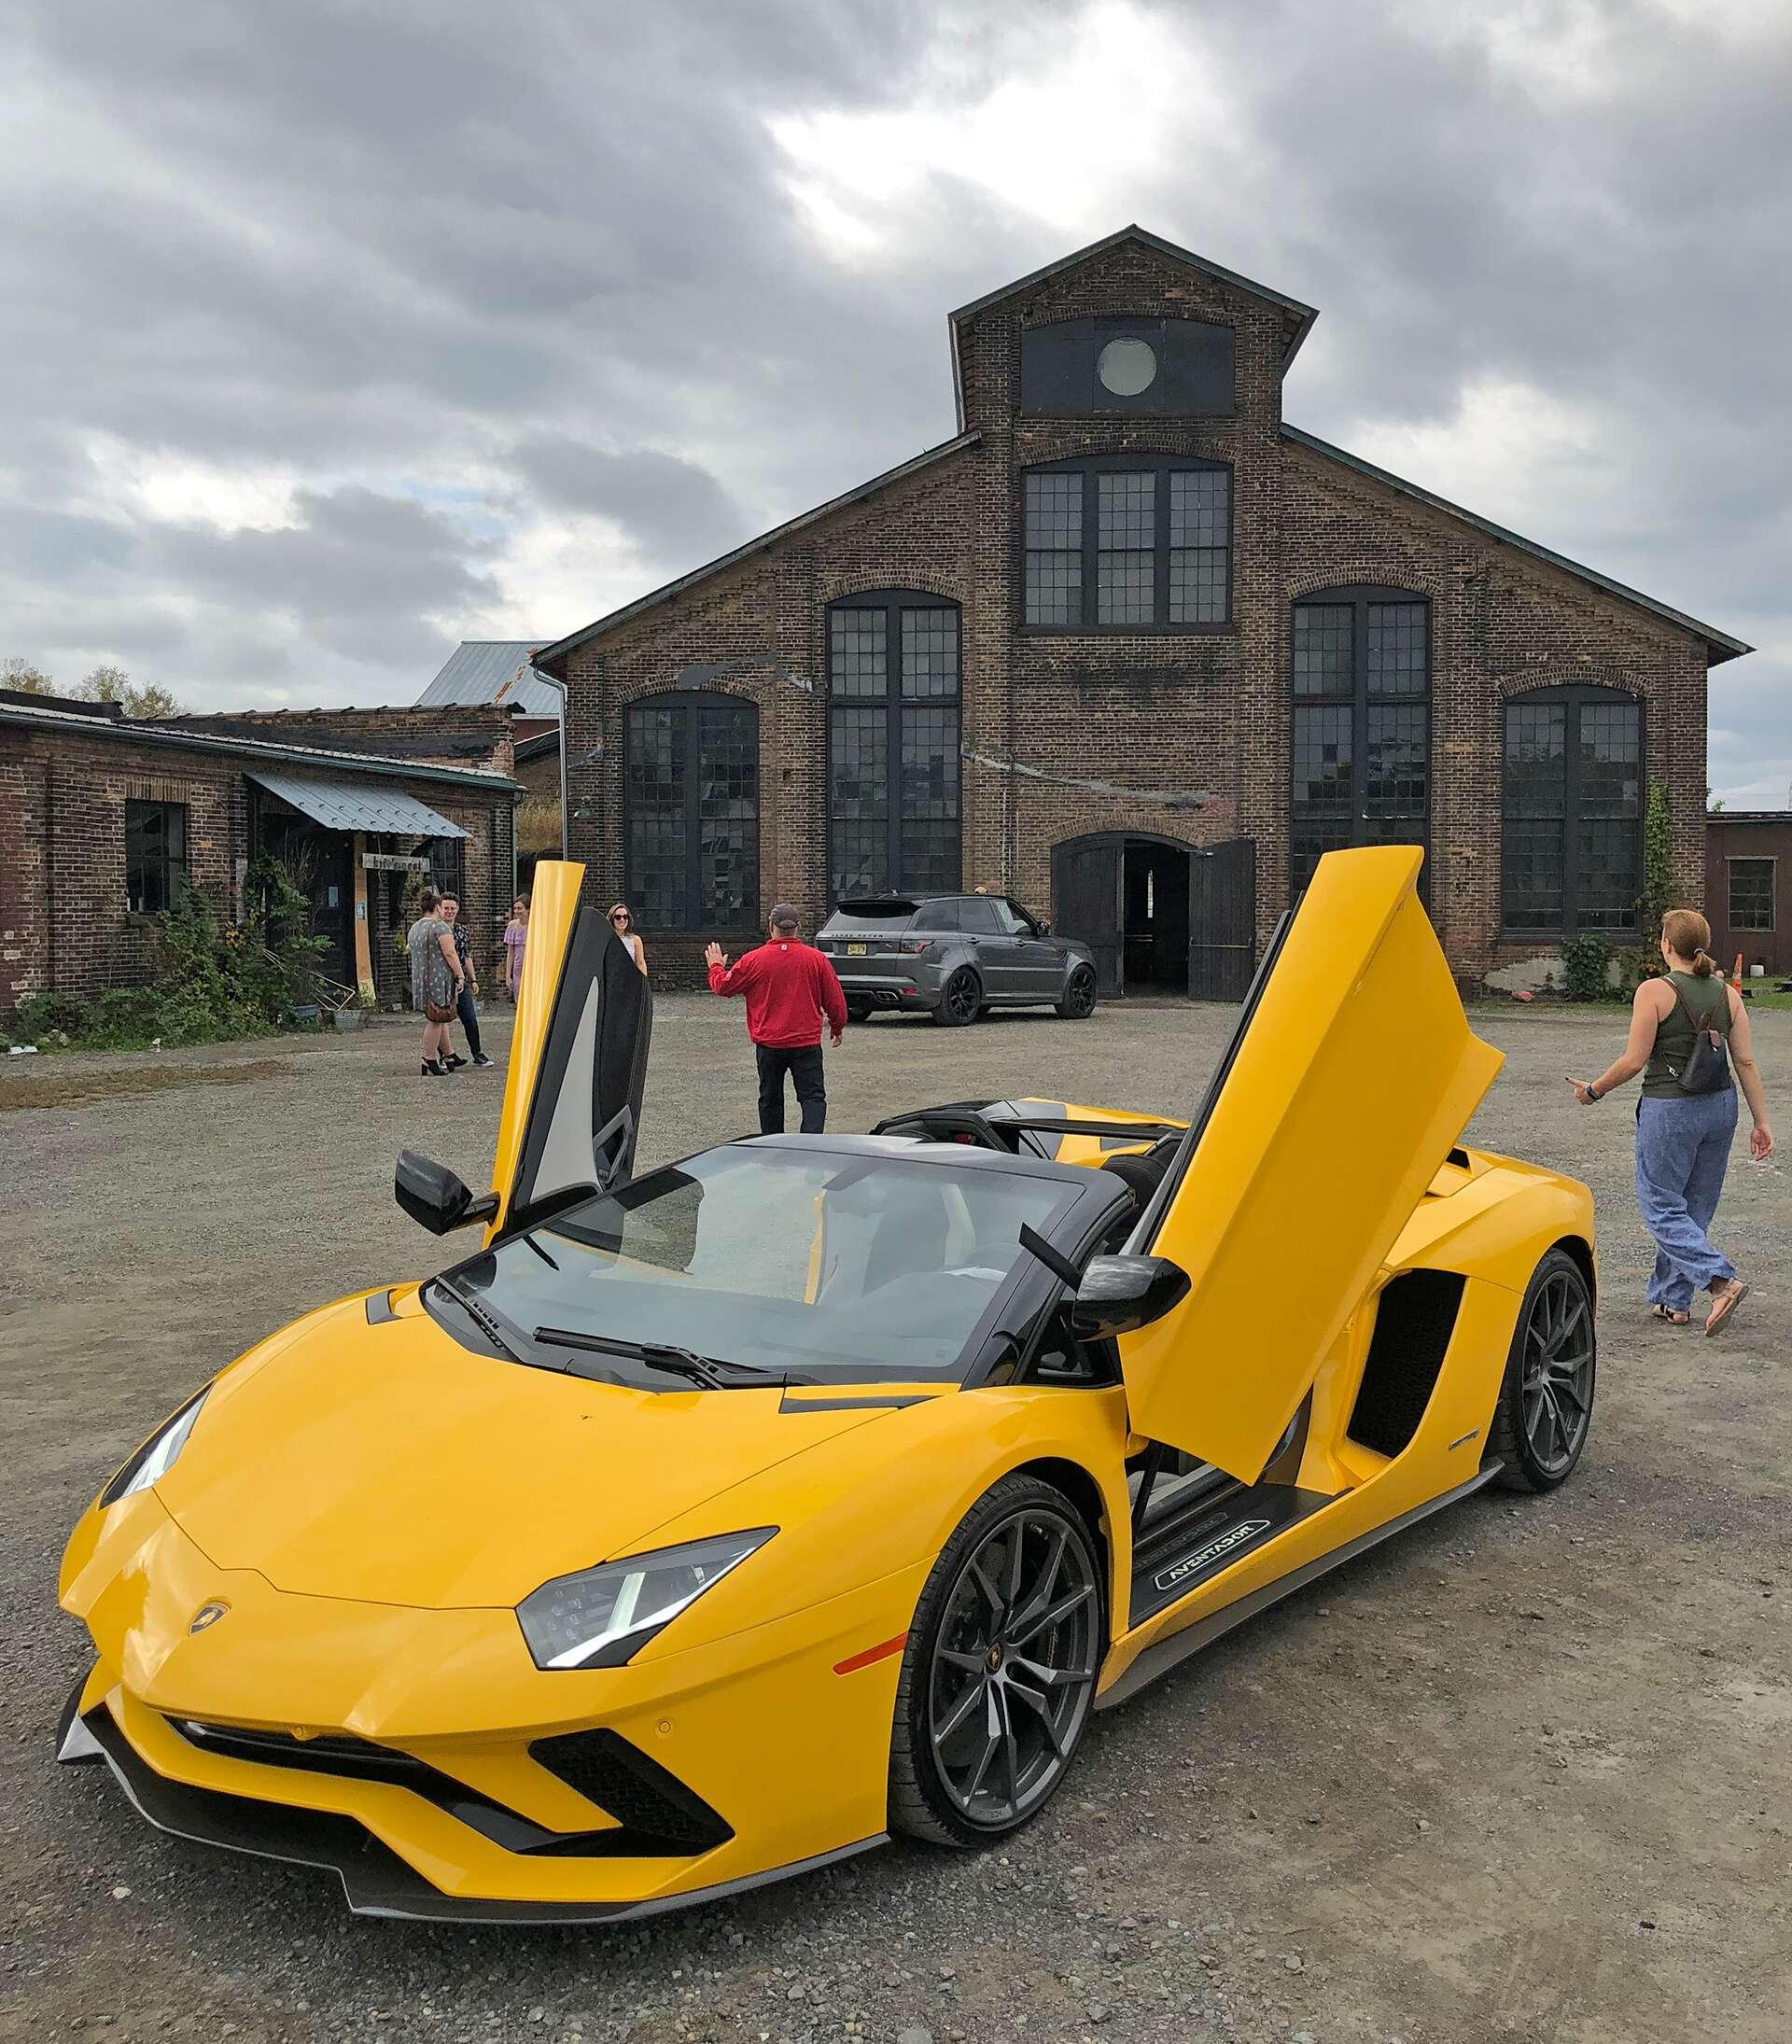 The 2018 Lamborghini Aventador S Roadster Instantly Makes